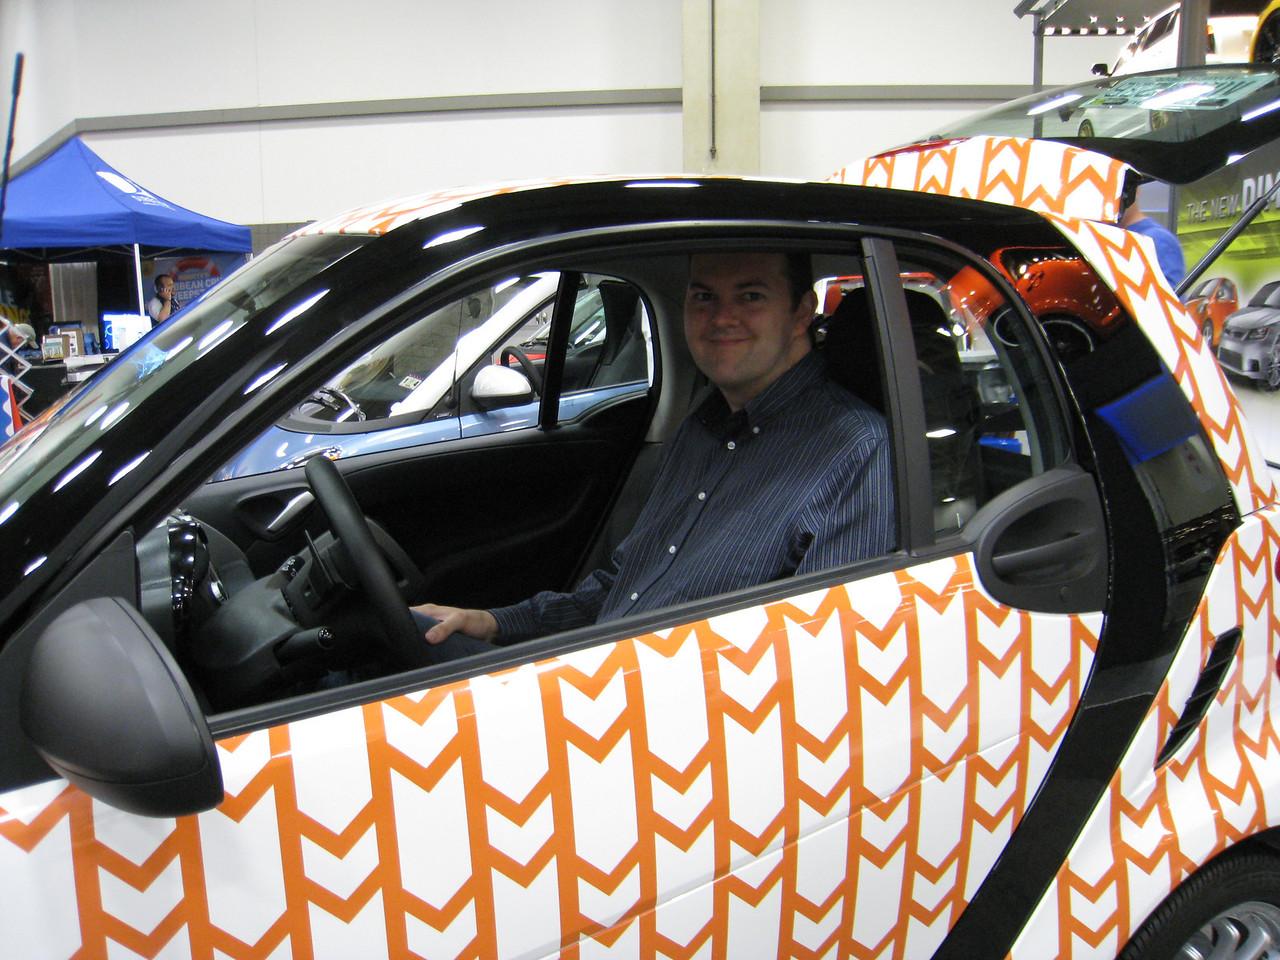 Myself sitting in a smart car